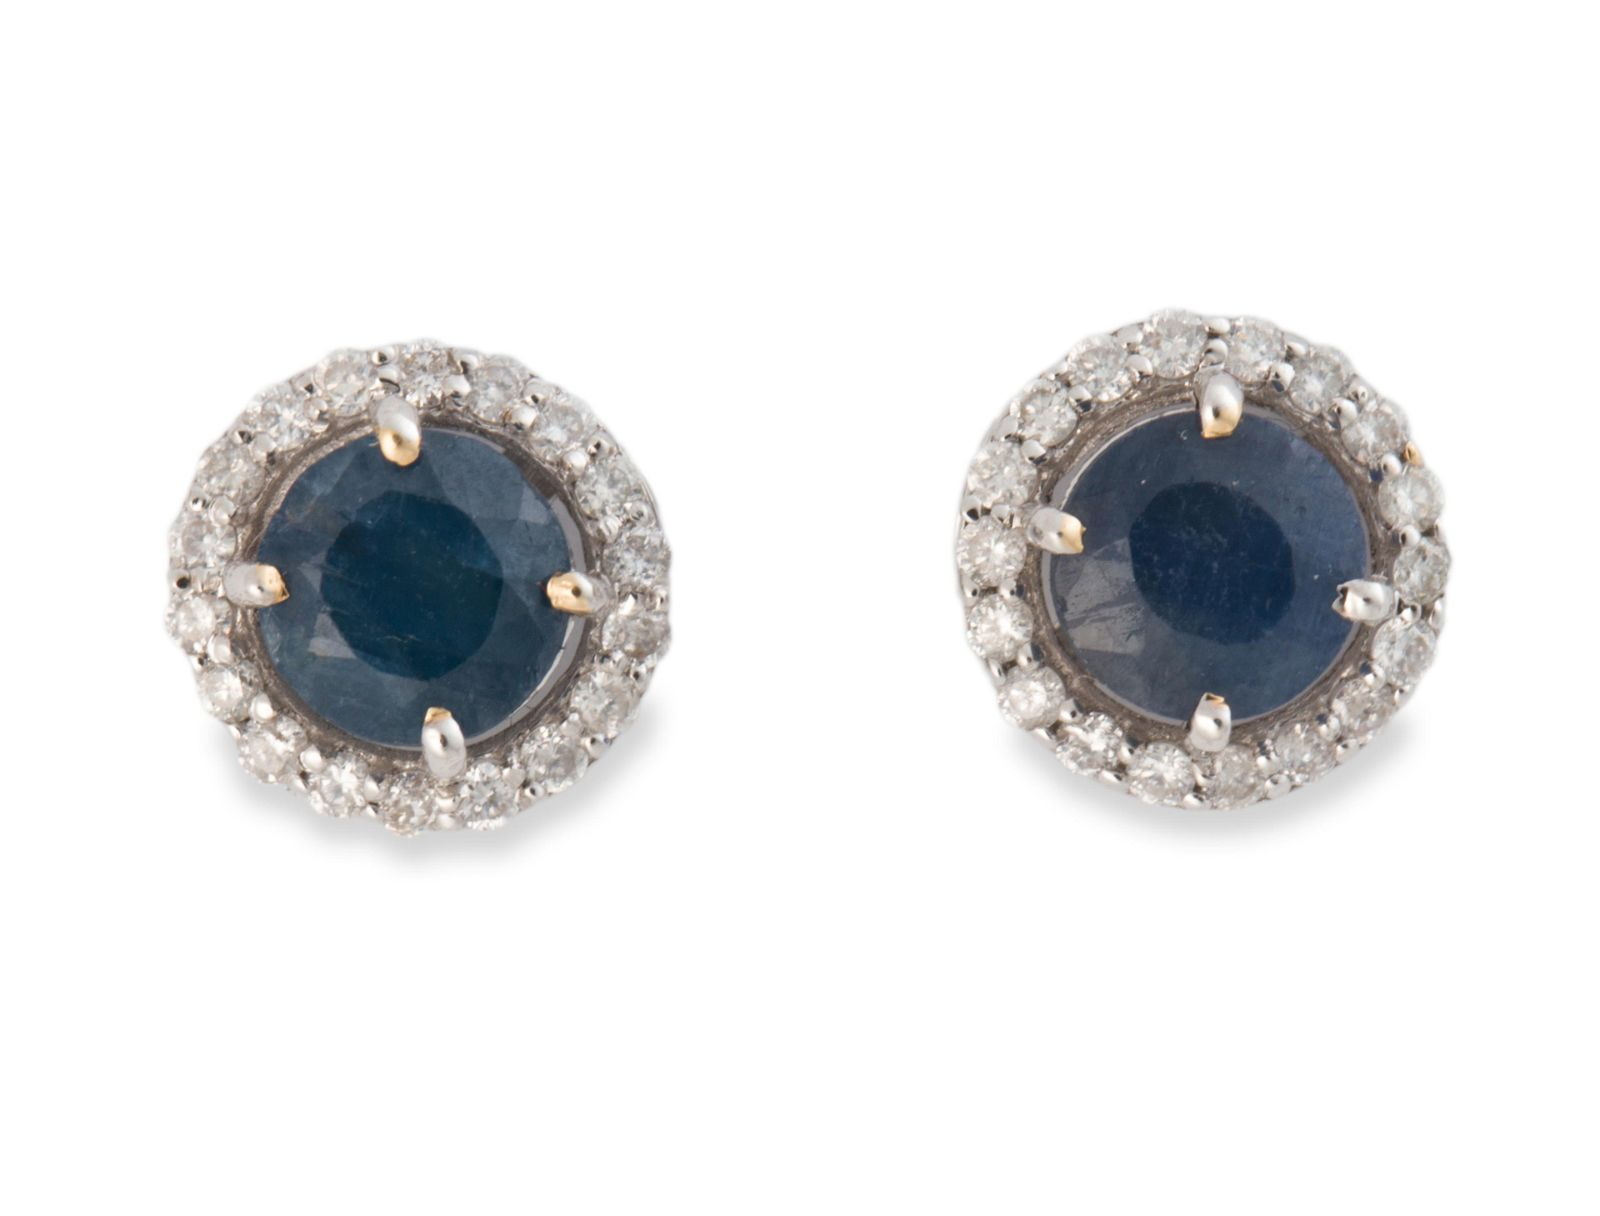 A pair of sapphire, diamond and fourteen karat white